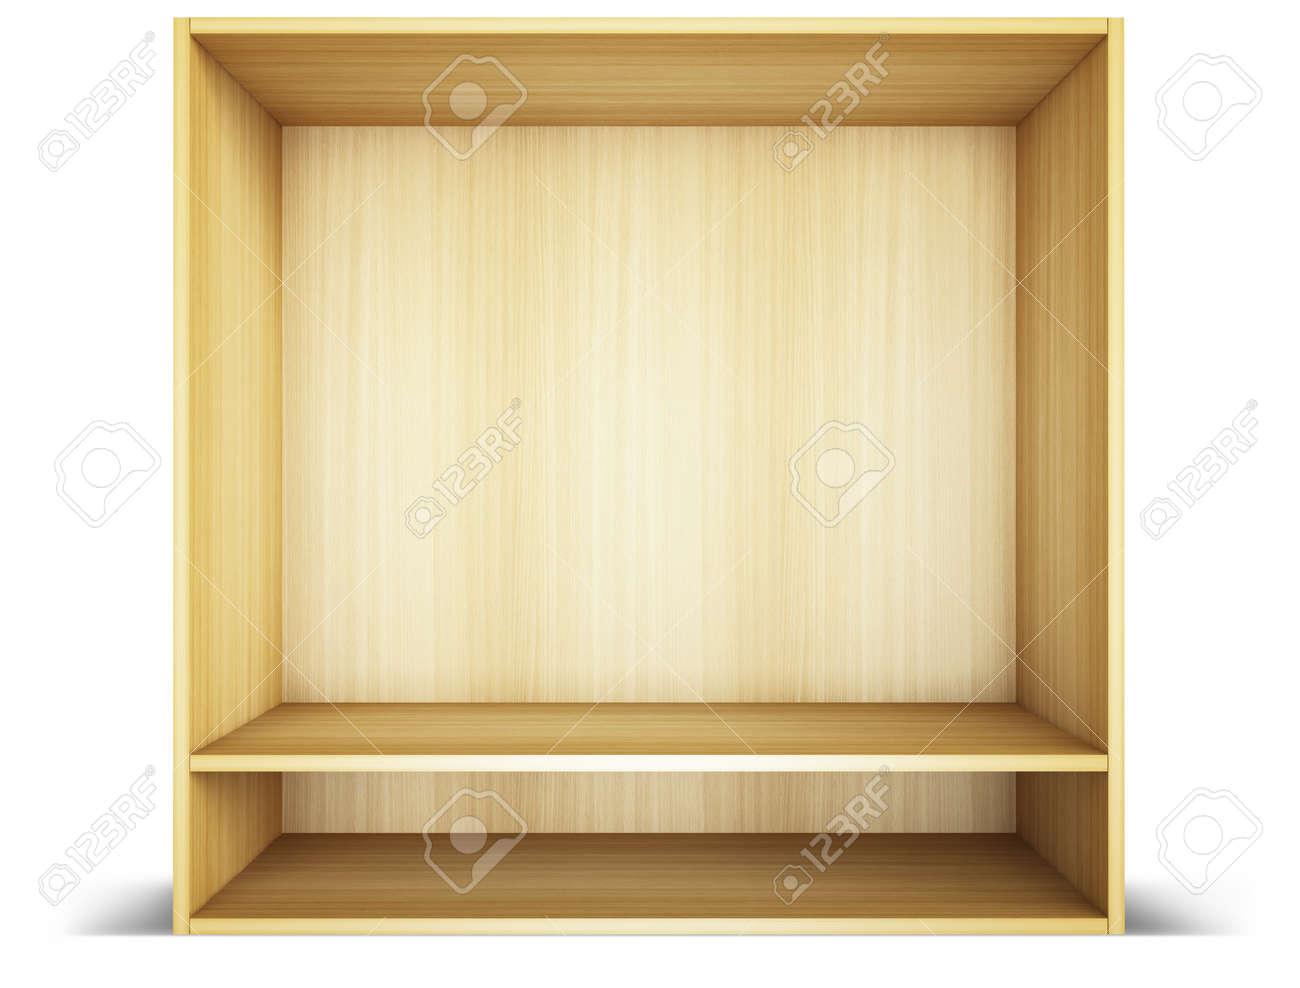 bookshelf Stock Photo - 8718981